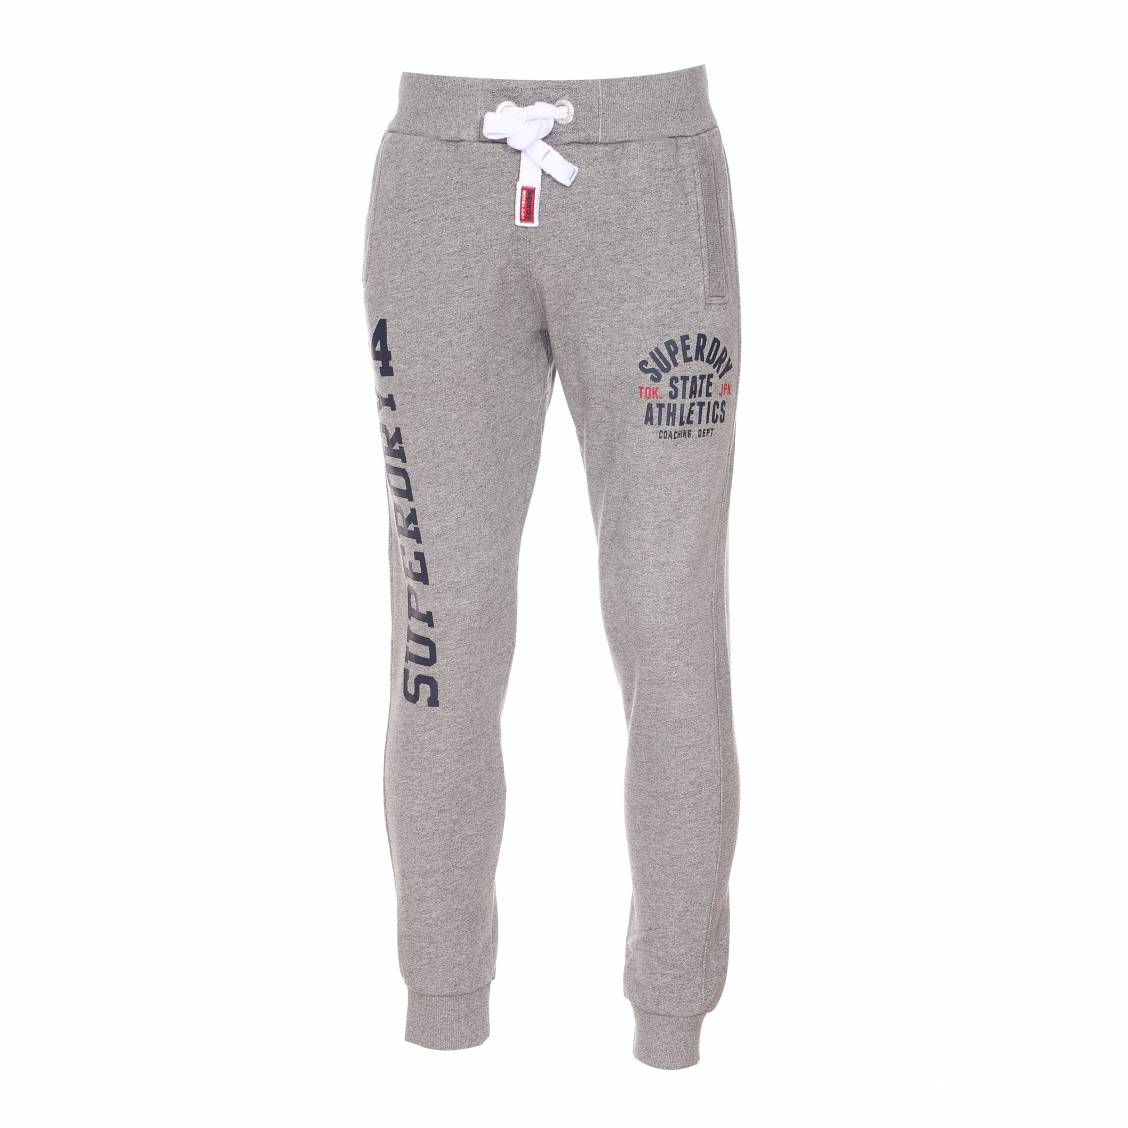 pantalon de jogging slim superdry gris clair chin rue des hommes. Black Bedroom Furniture Sets. Home Design Ideas